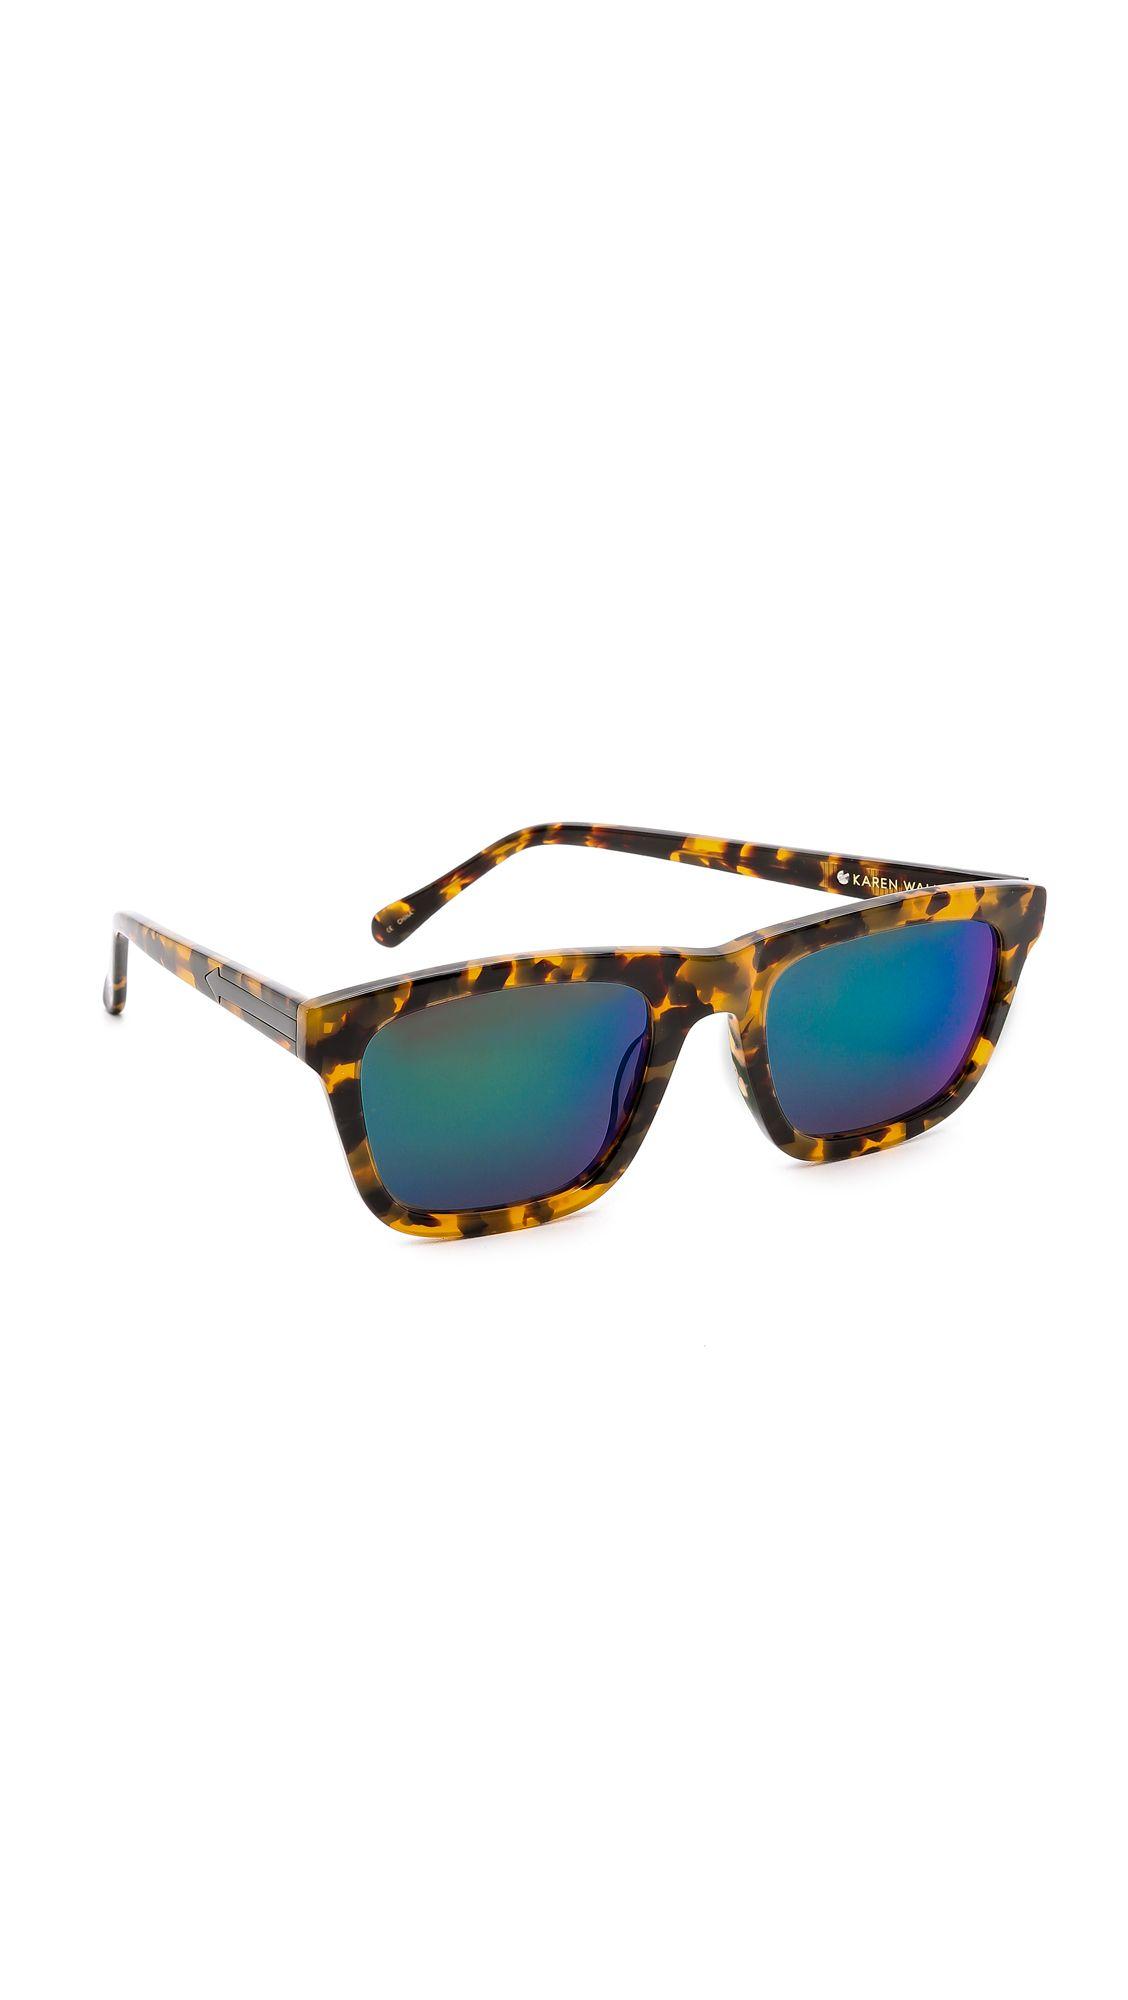 785ed276519 Karen Walker Superstars Collection Number One Mirrored Sunglasses